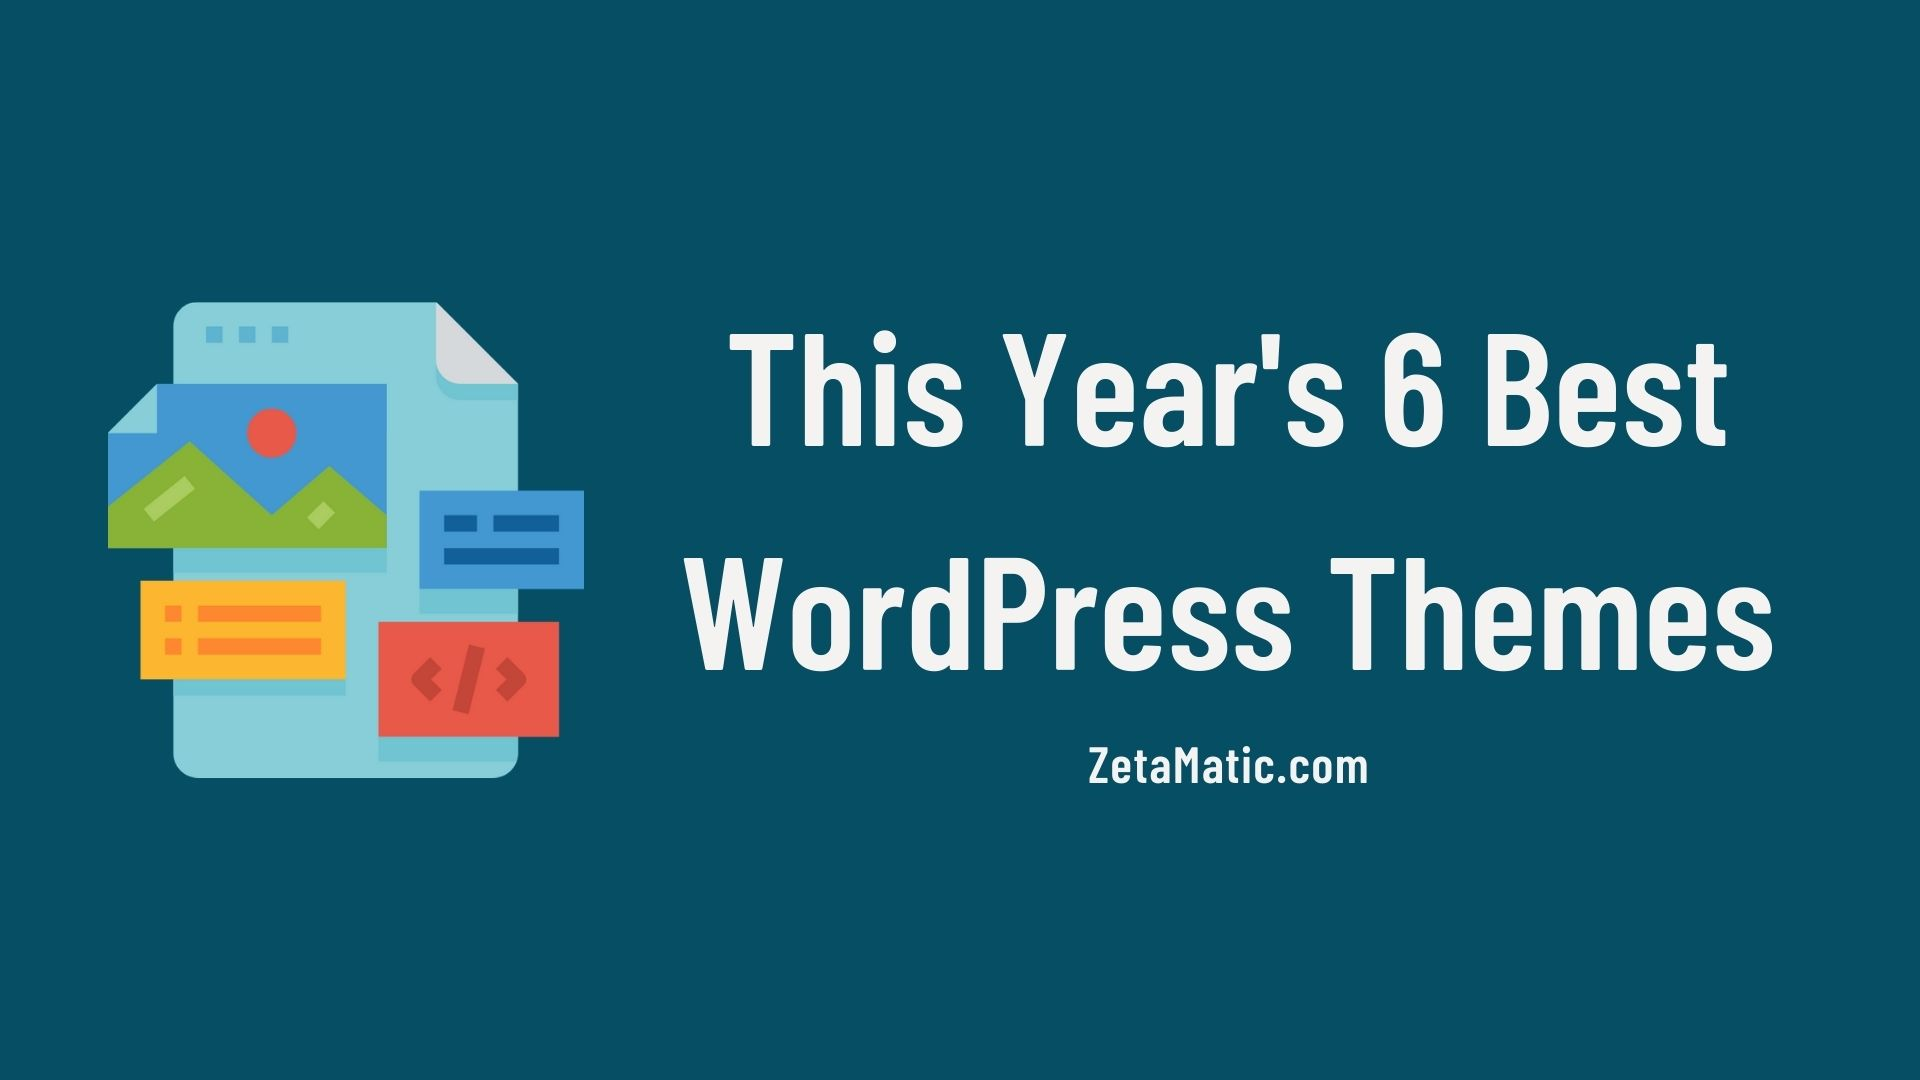 This Year's 6 Best WordPress Themes